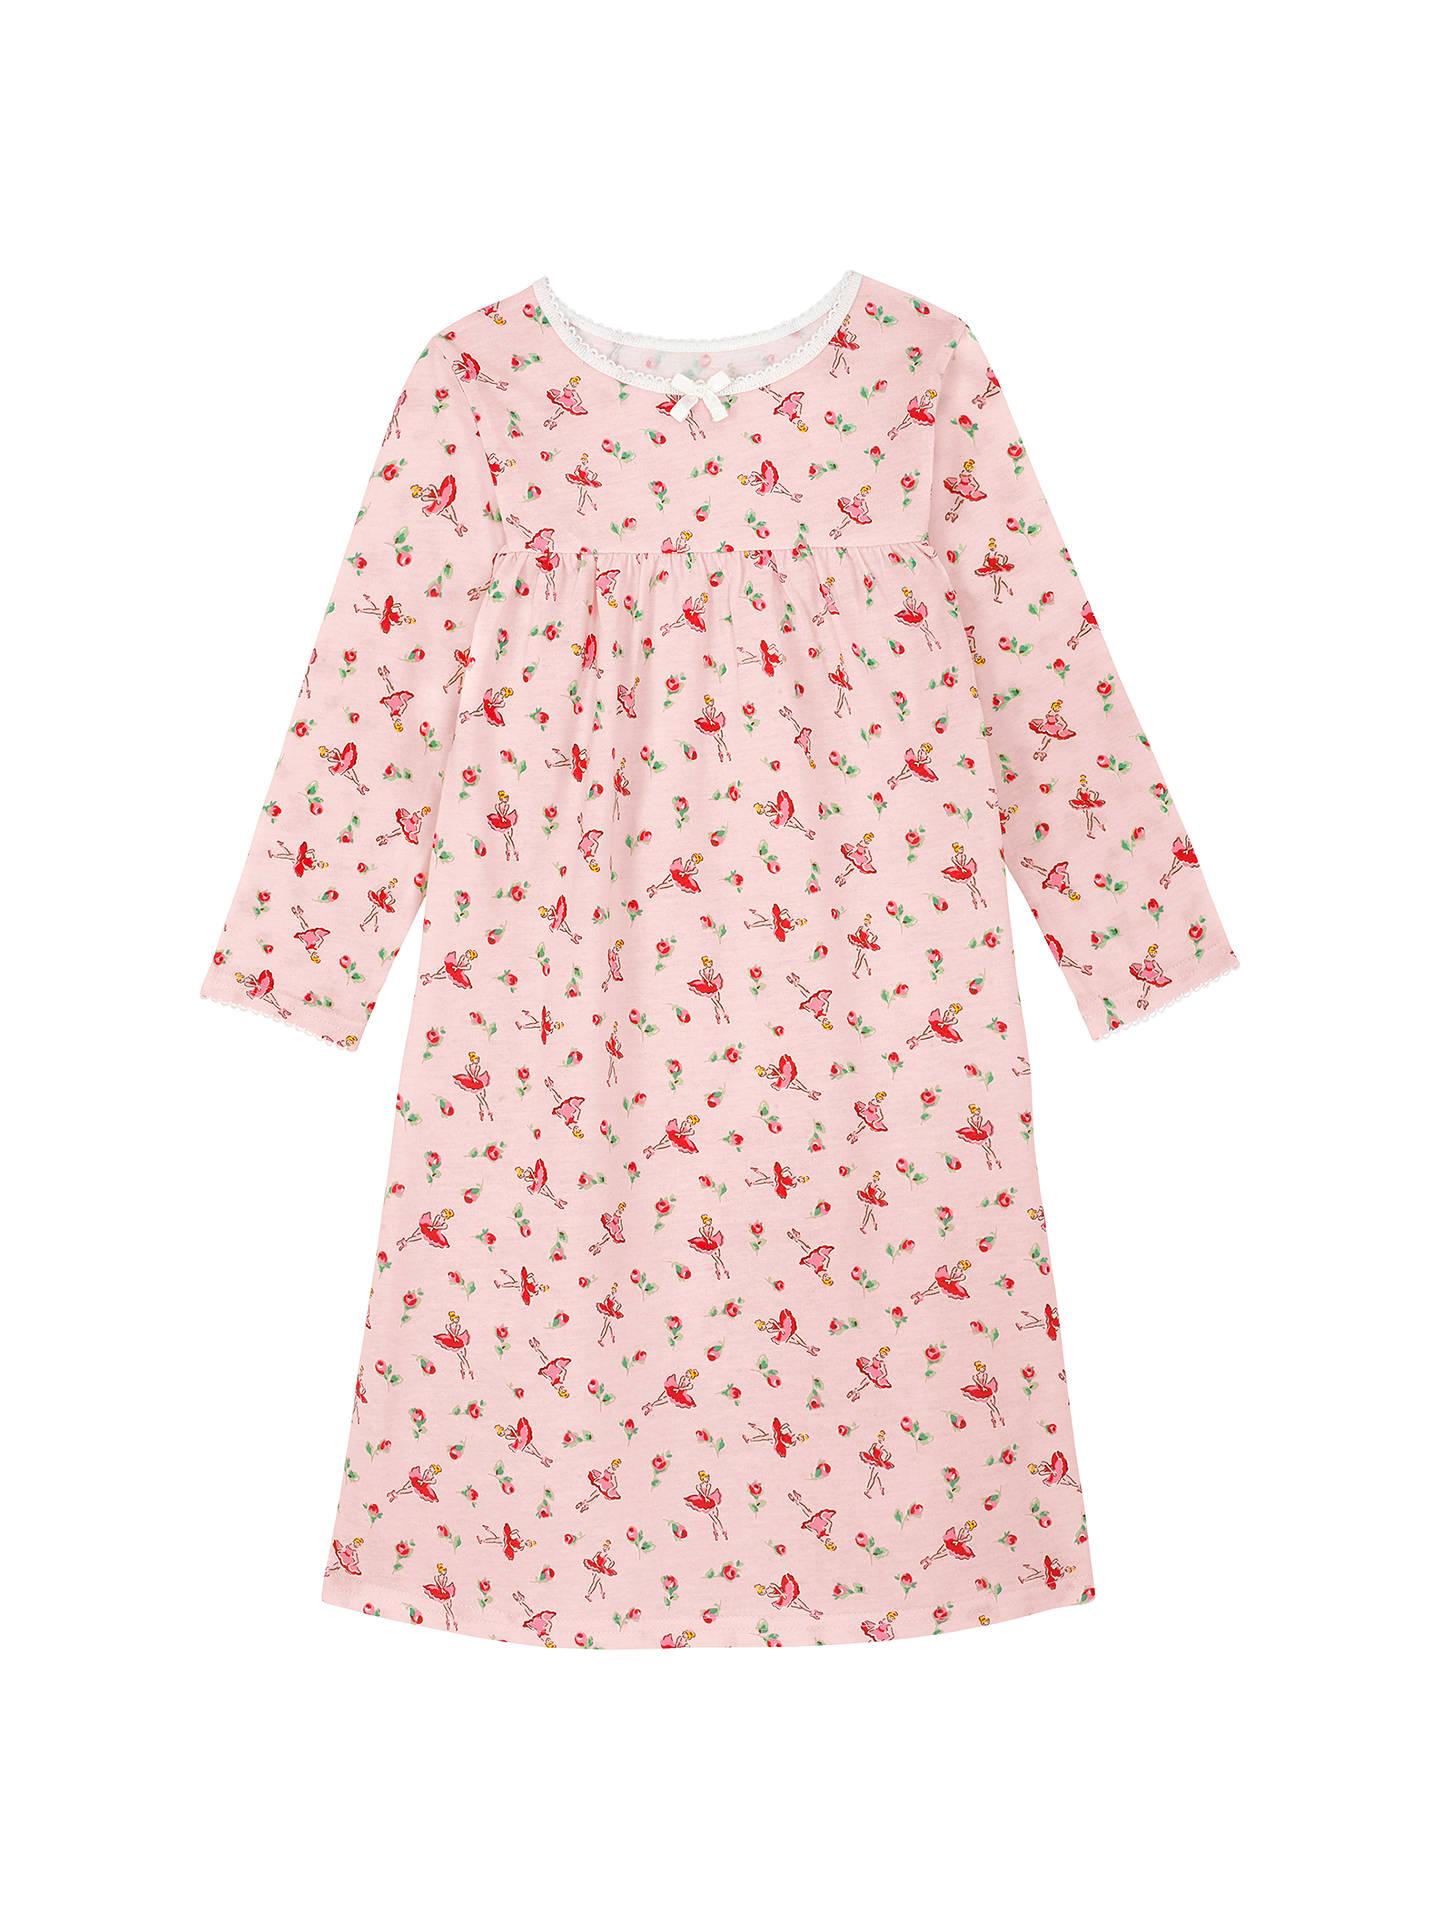 6b4ff36cbb BuyCath Kids Girls  Ballerina Rose Night Dress